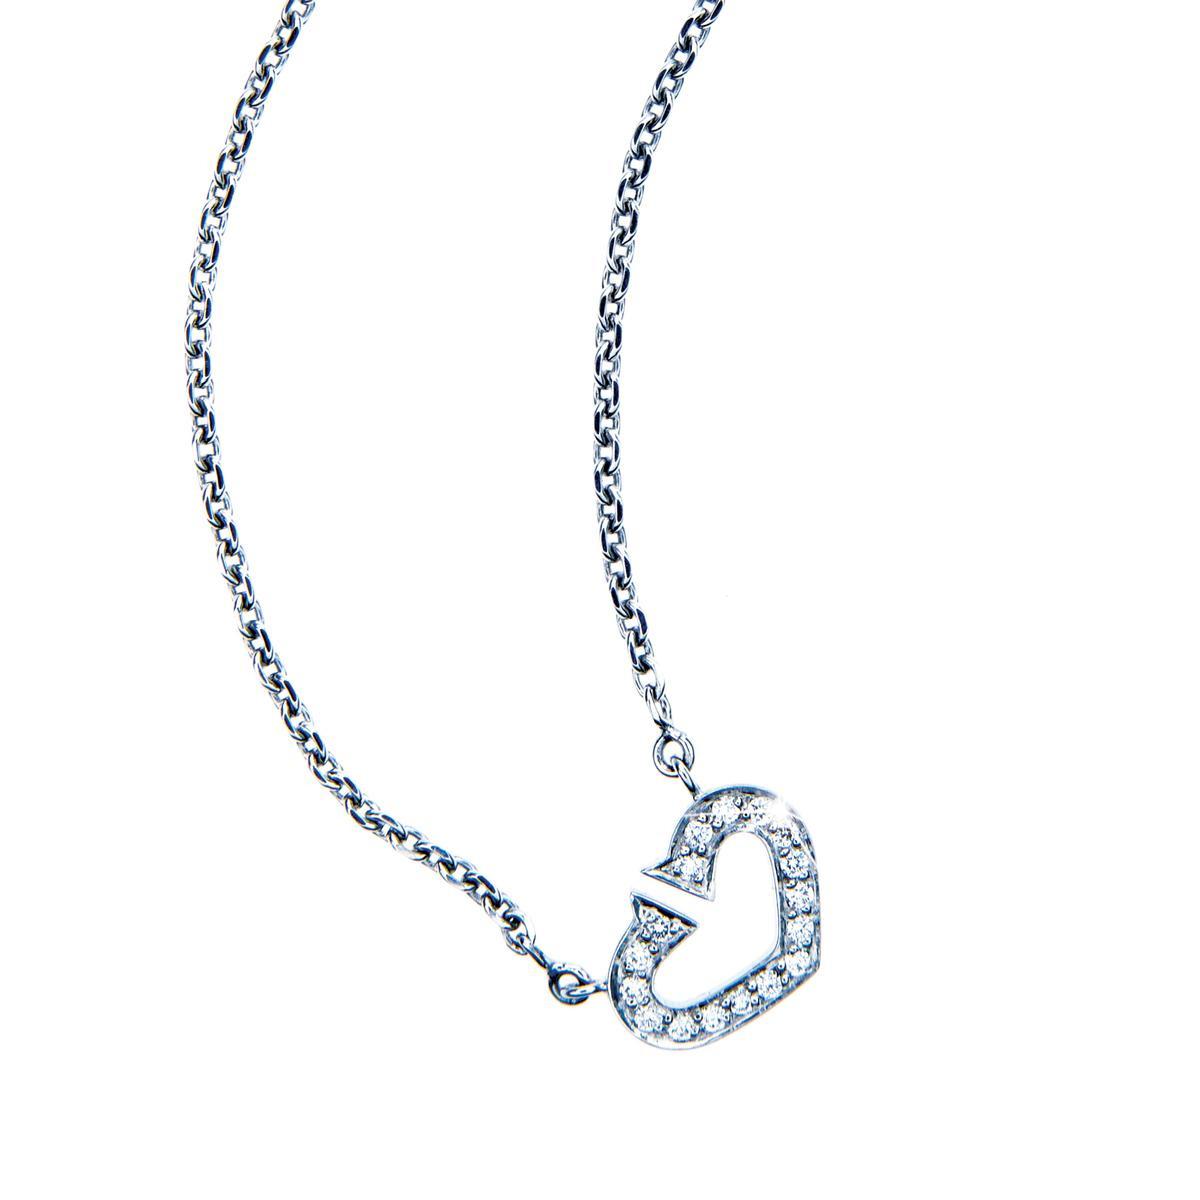 Vintage Hearts of Cartier Diamond Necklace